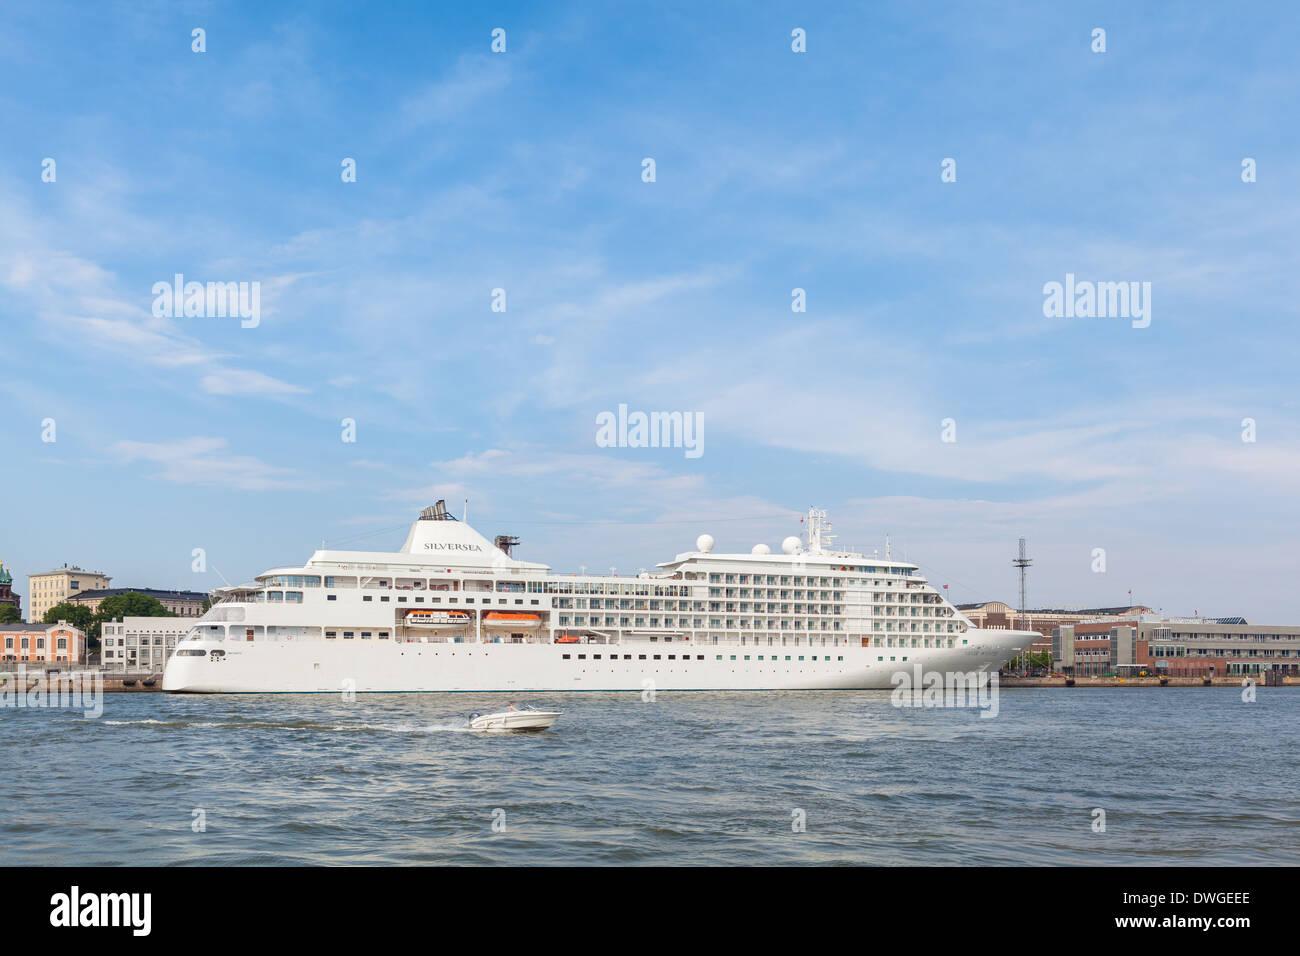 Silversea passenger ship - Stock Image